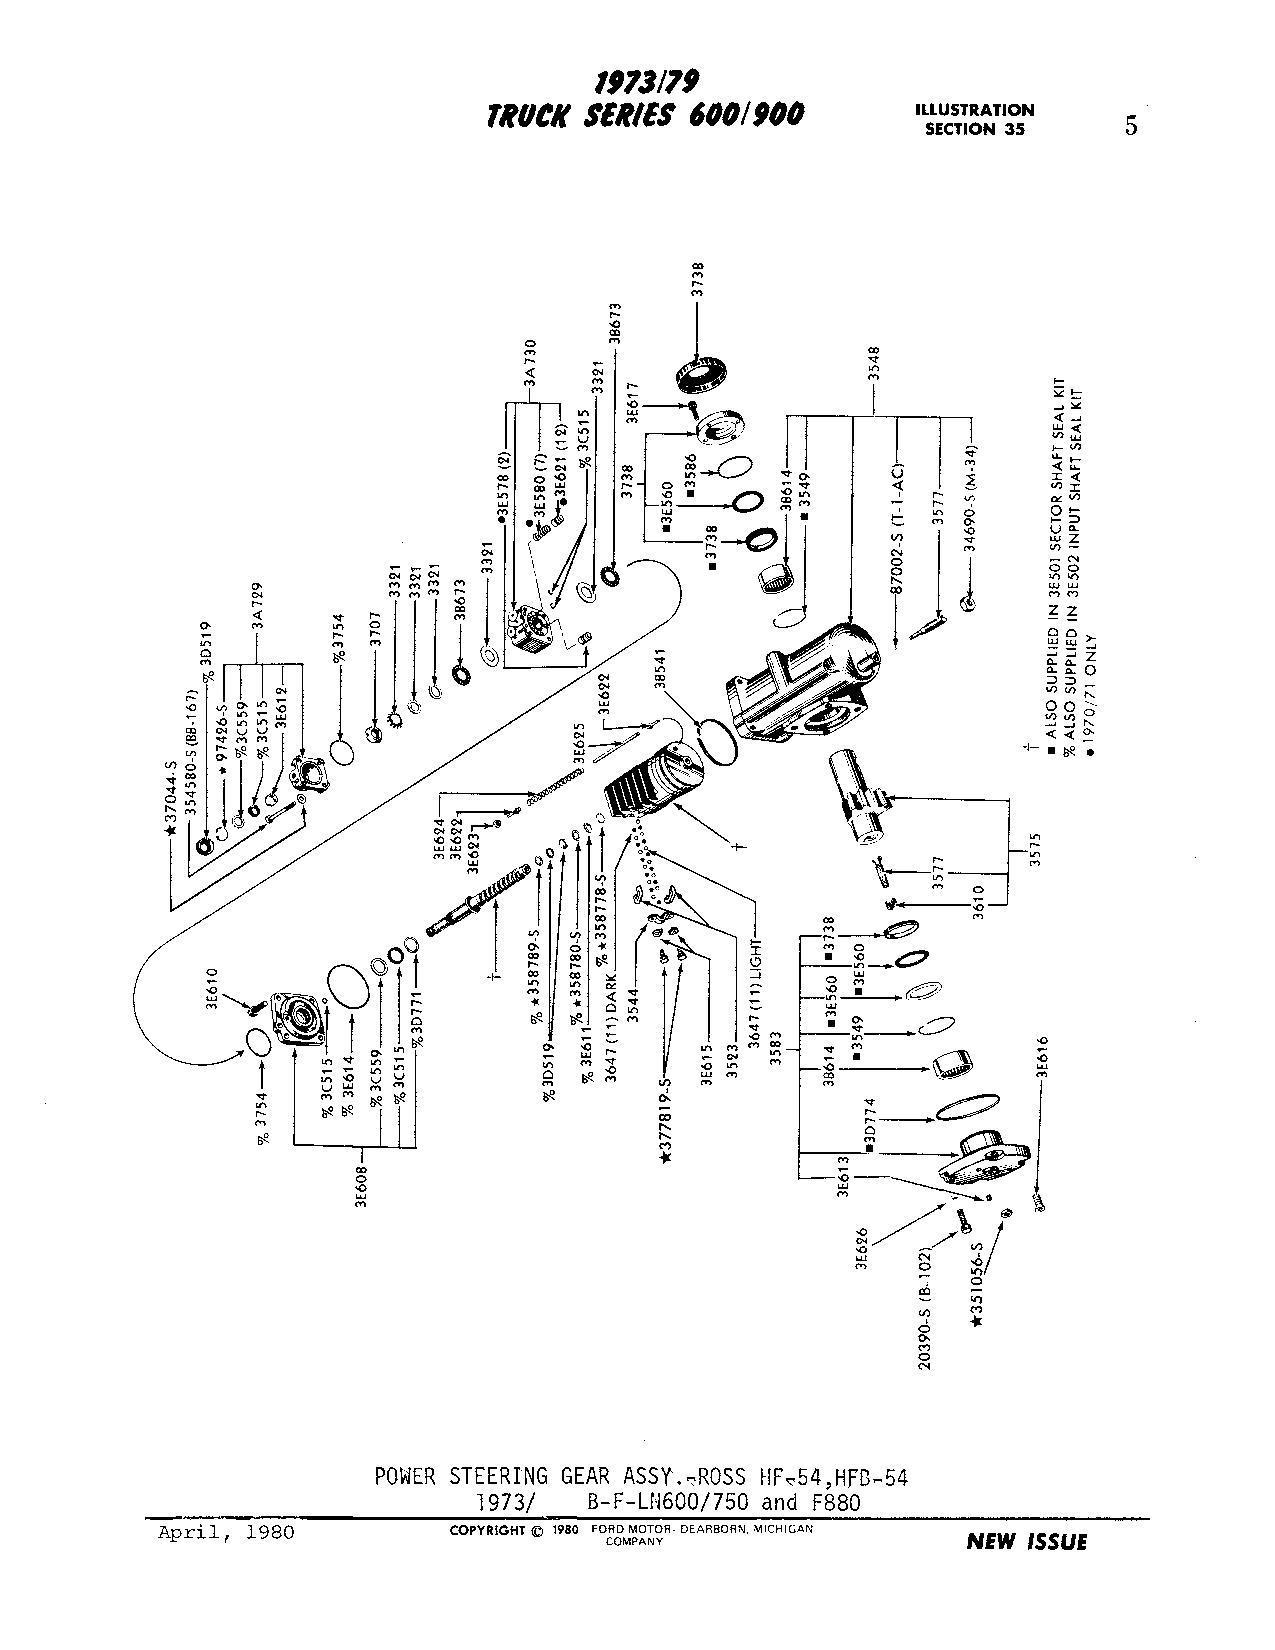 2 Speed Rear Axle Wiring Diagram